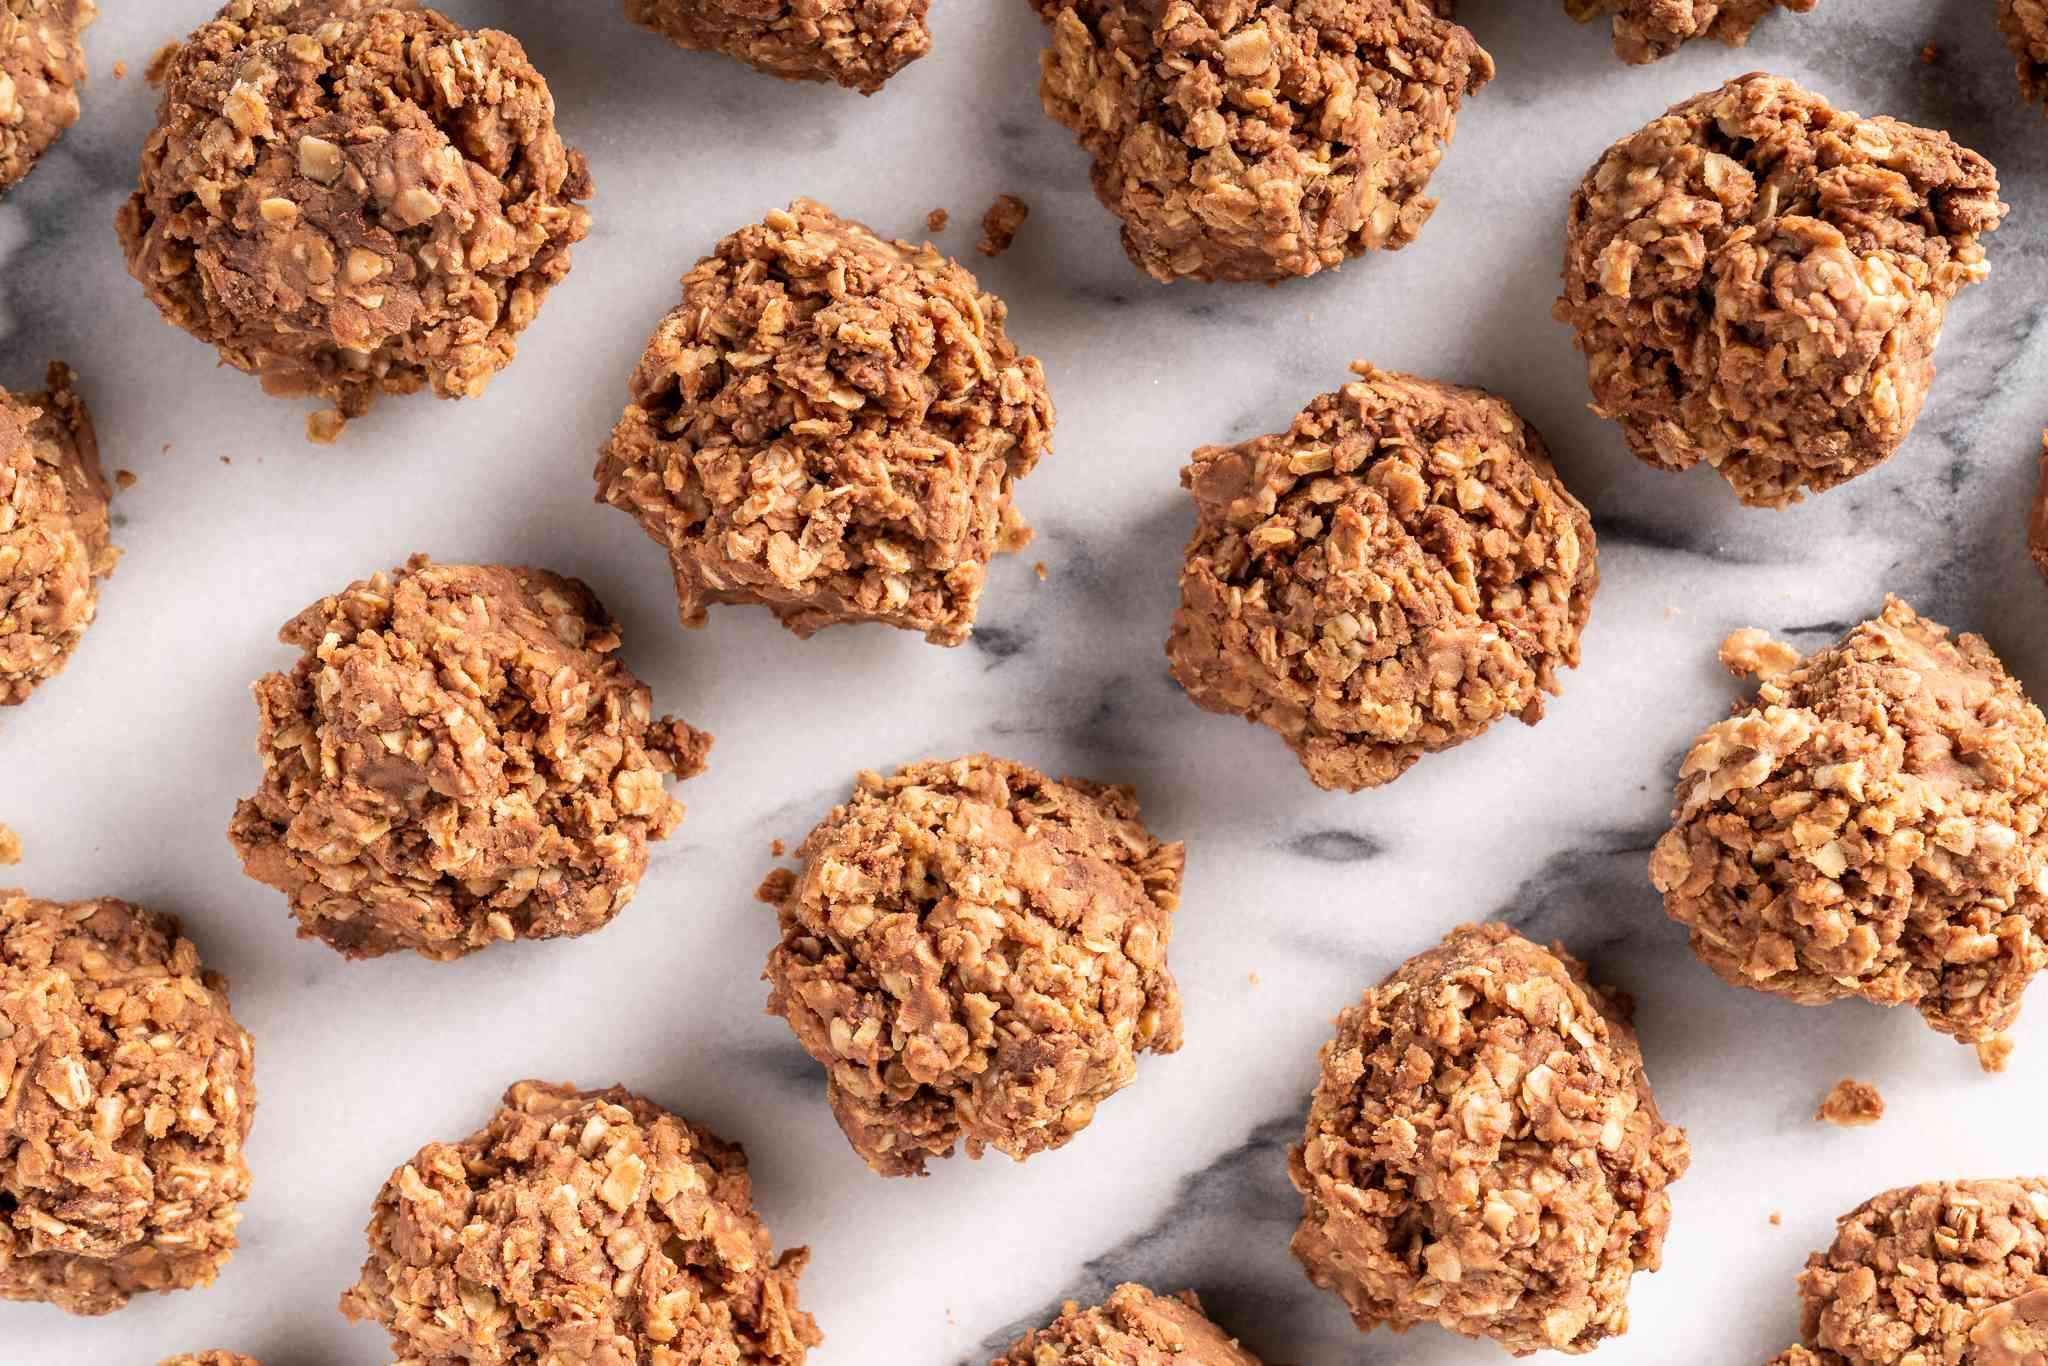 Easy Gluten-Free Chocolate Oatmeal No-Bake Cookies